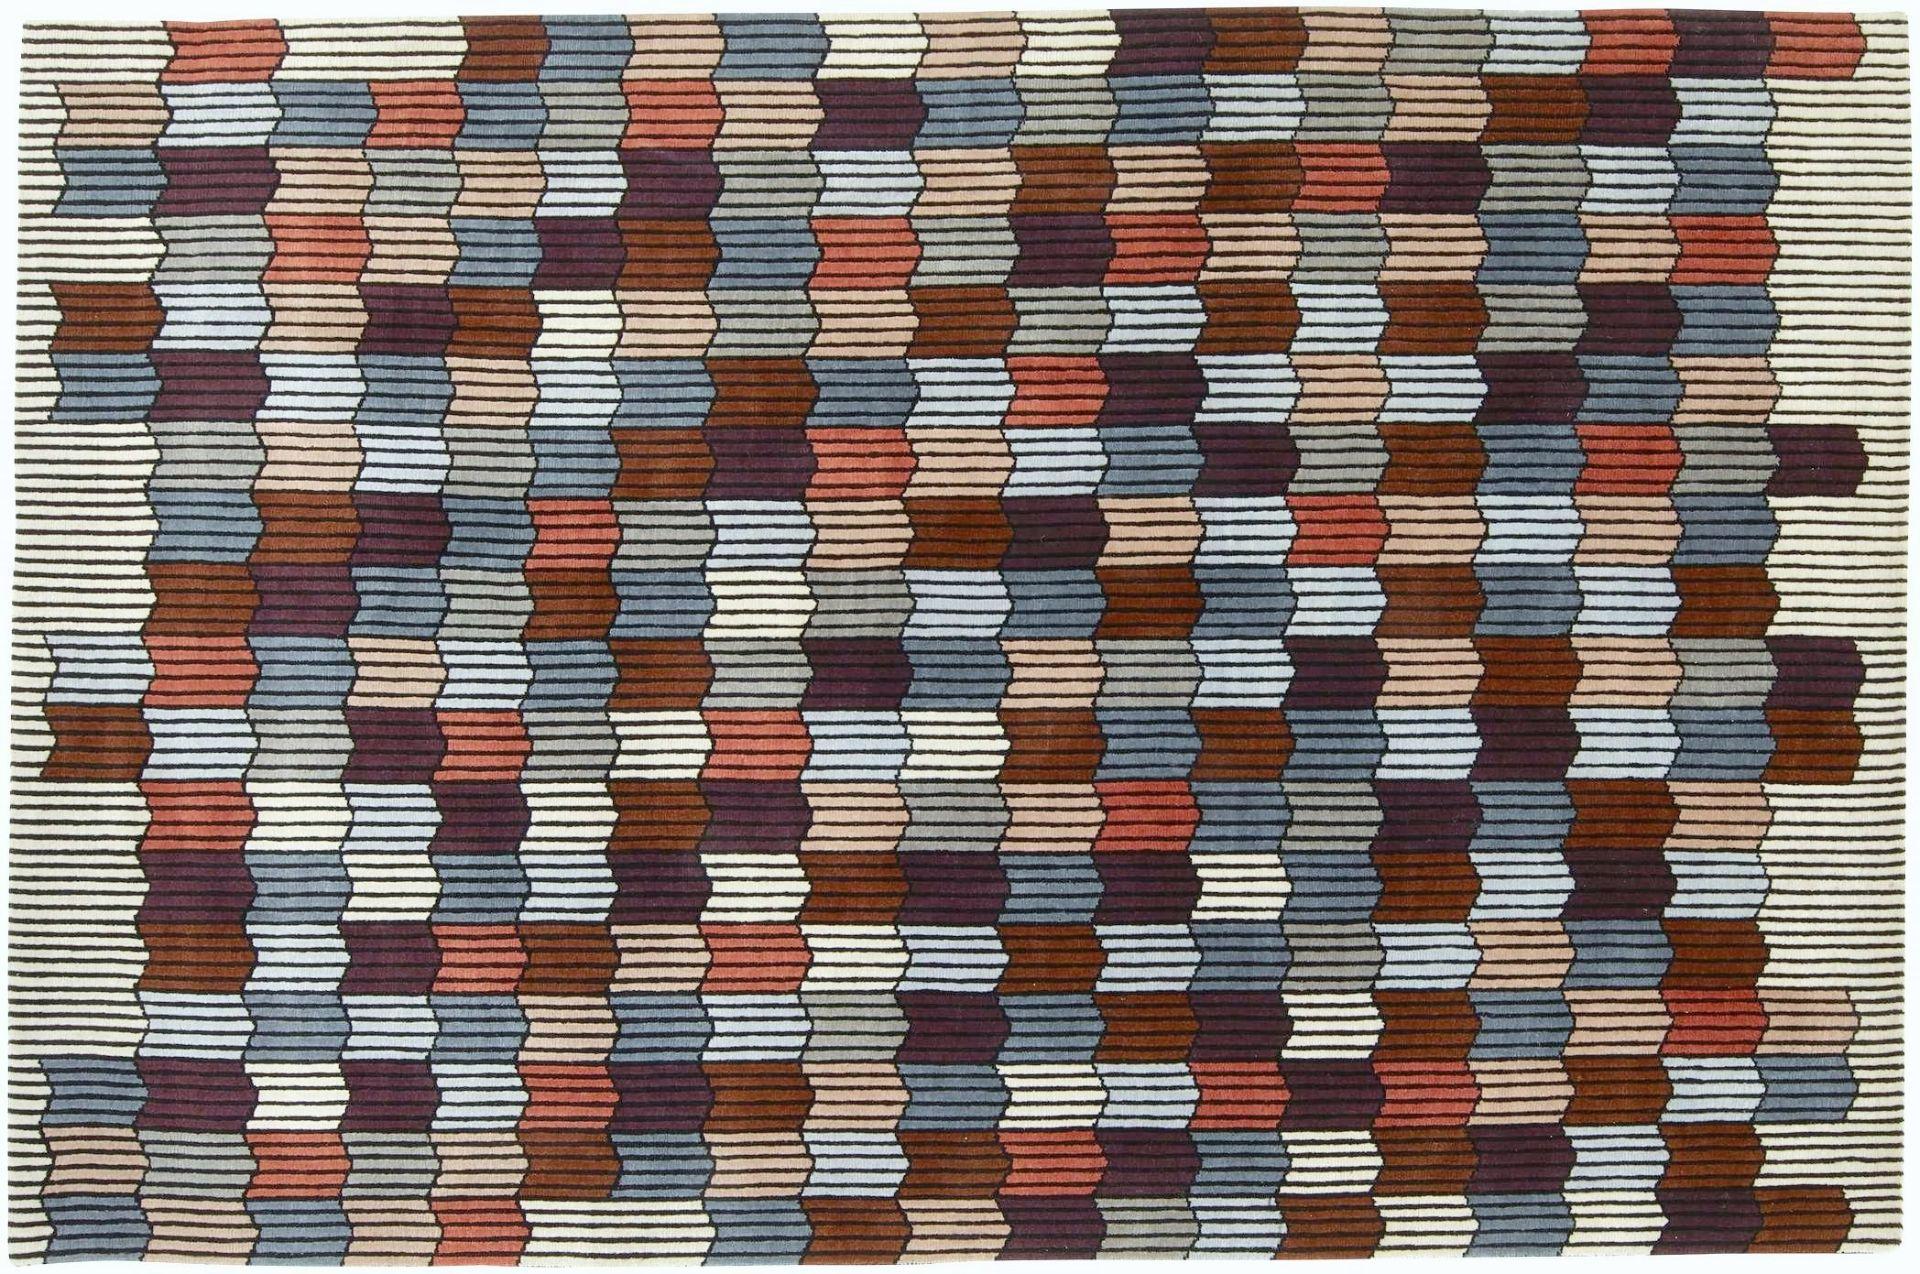 1 x LIGNE ROSET 'Mémoire d'une Trame' Designer Hand-knotted Pastel ColouredLuxury Rug- RRP £2,450 - Image 8 of 8